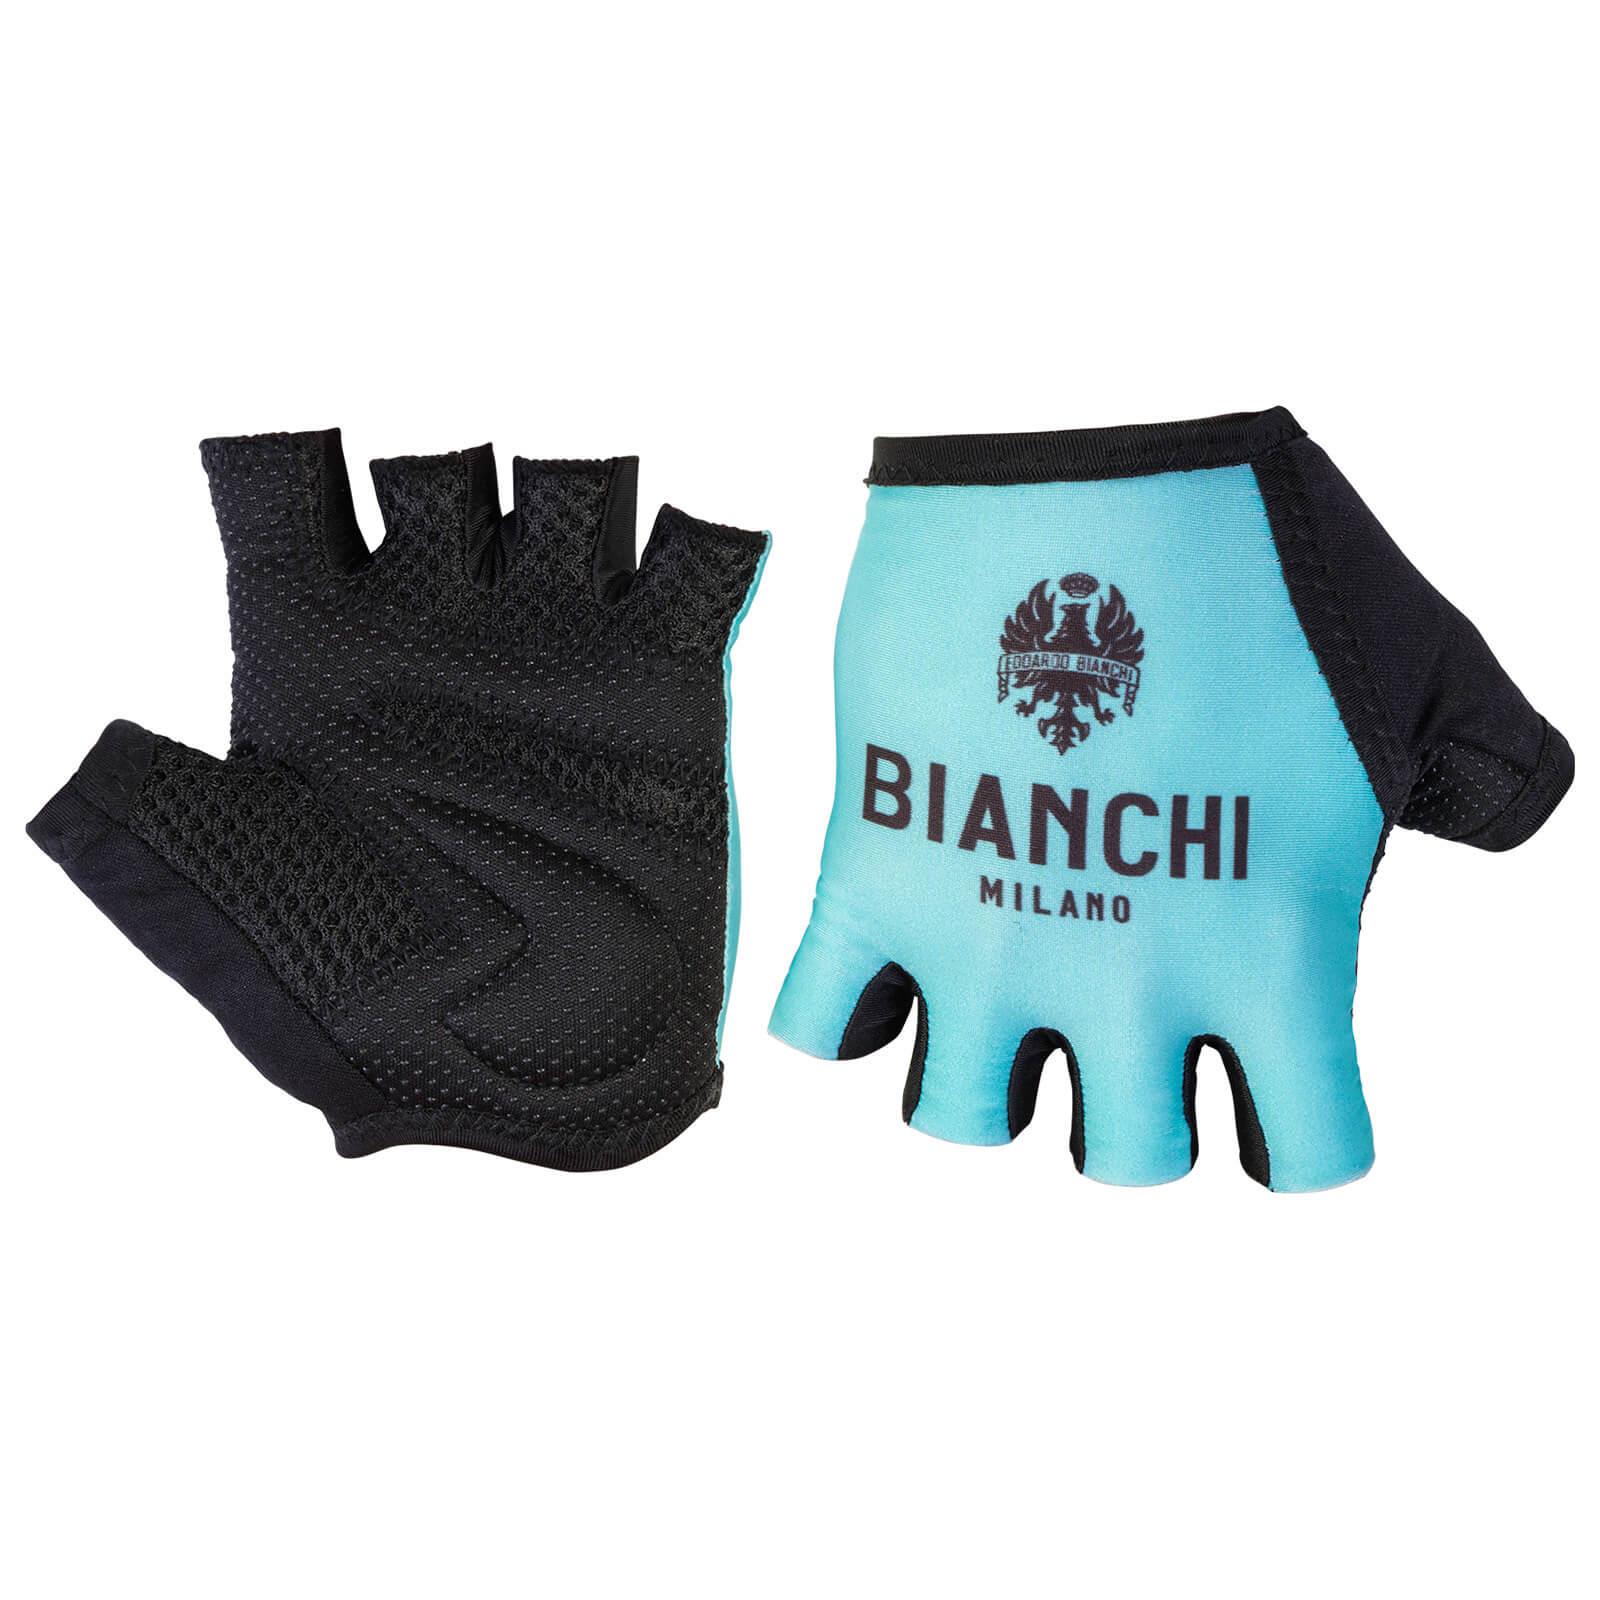 Bianchi Divor Gloves - XL - Celeste